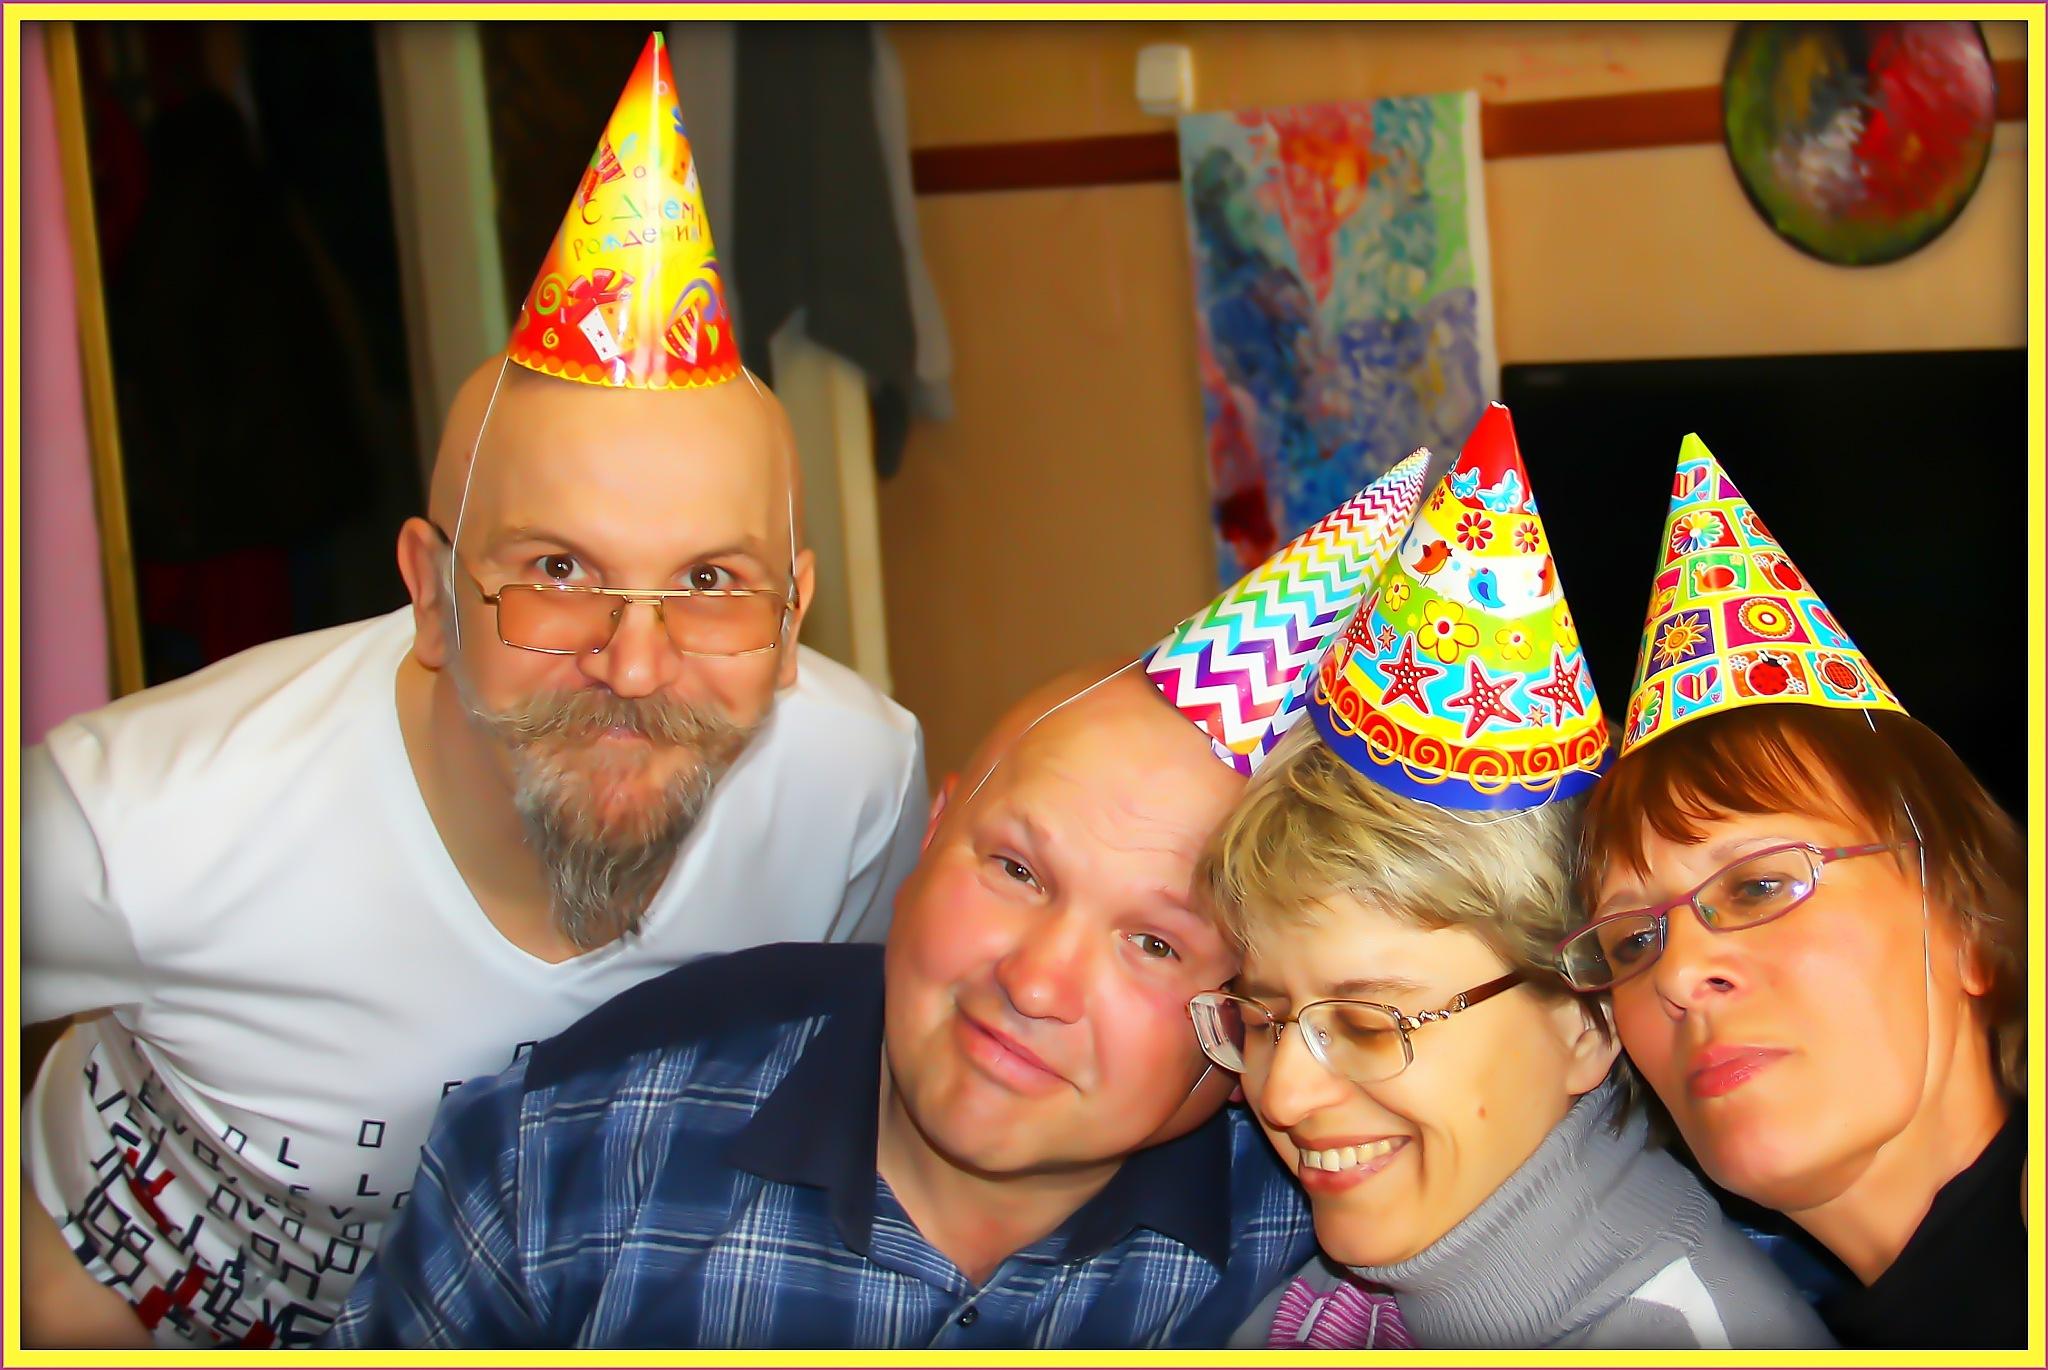 My cheerful Birthday by sergey.parfeniuk